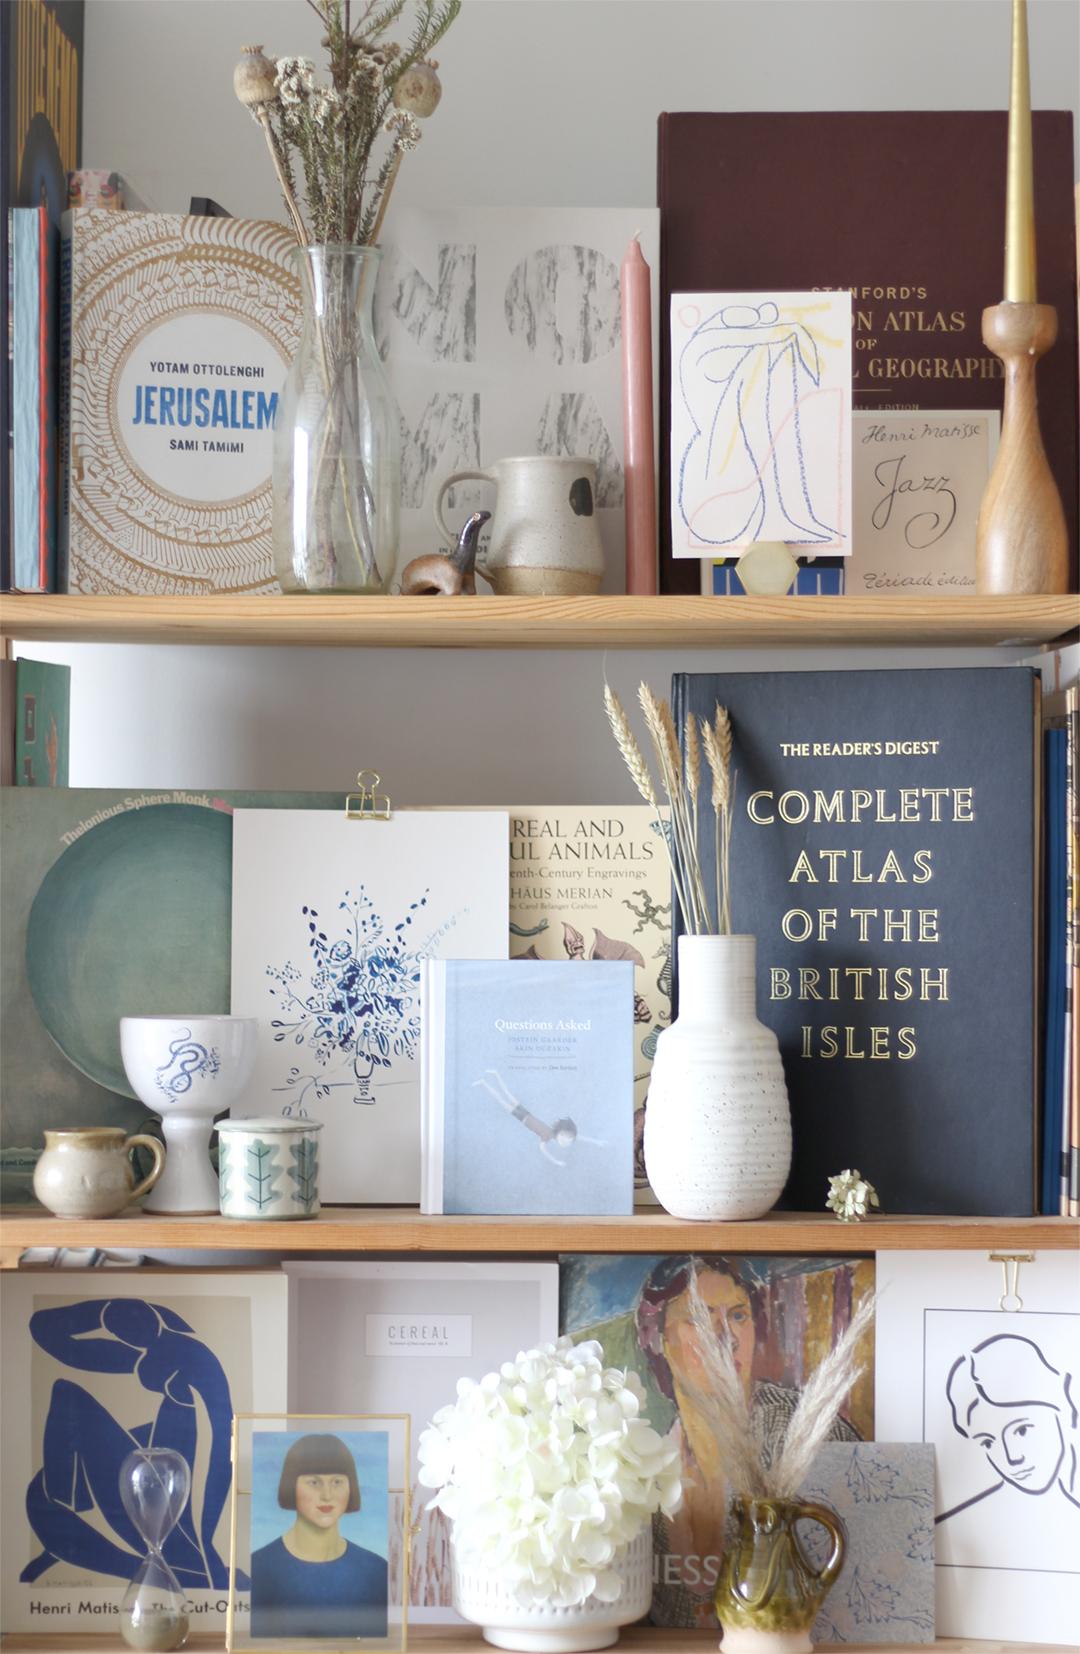 nancy-straughan-interior-stylist-styled-bookshelves-maximalism-shelfie.jpg